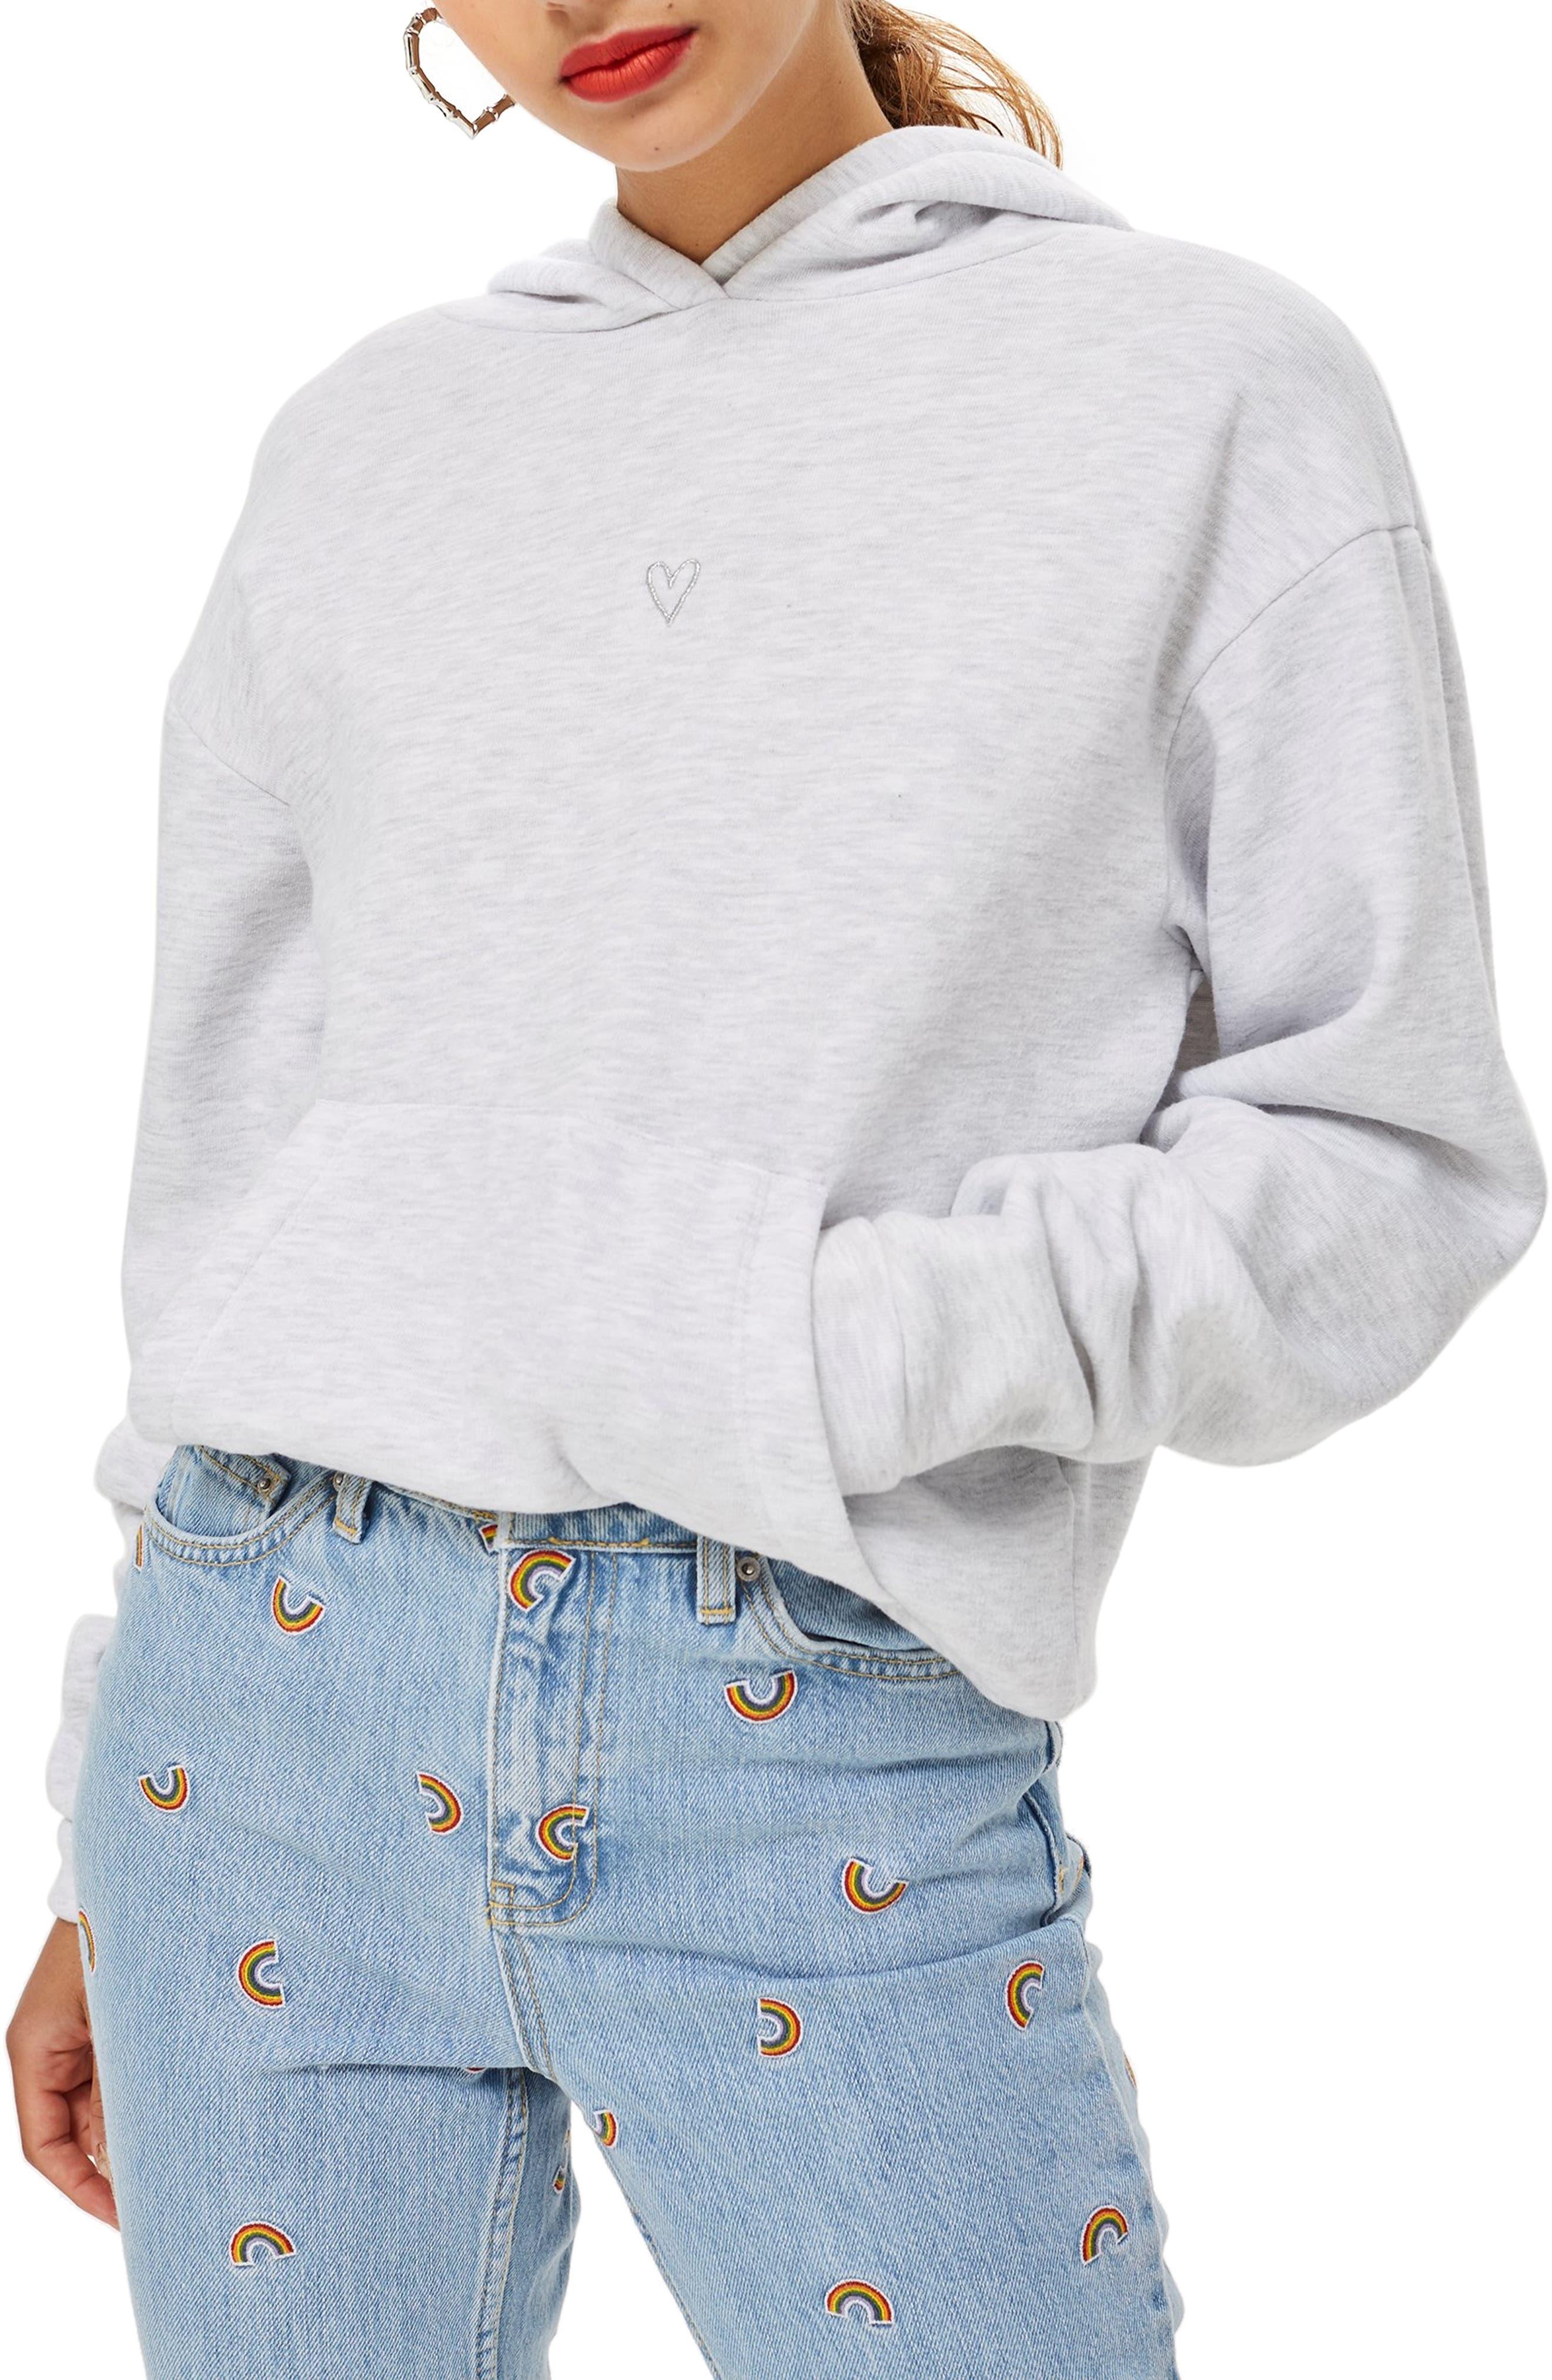 Heart Hoodie Sweatshirt,                             Main thumbnail 1, color,                             GREY MARL